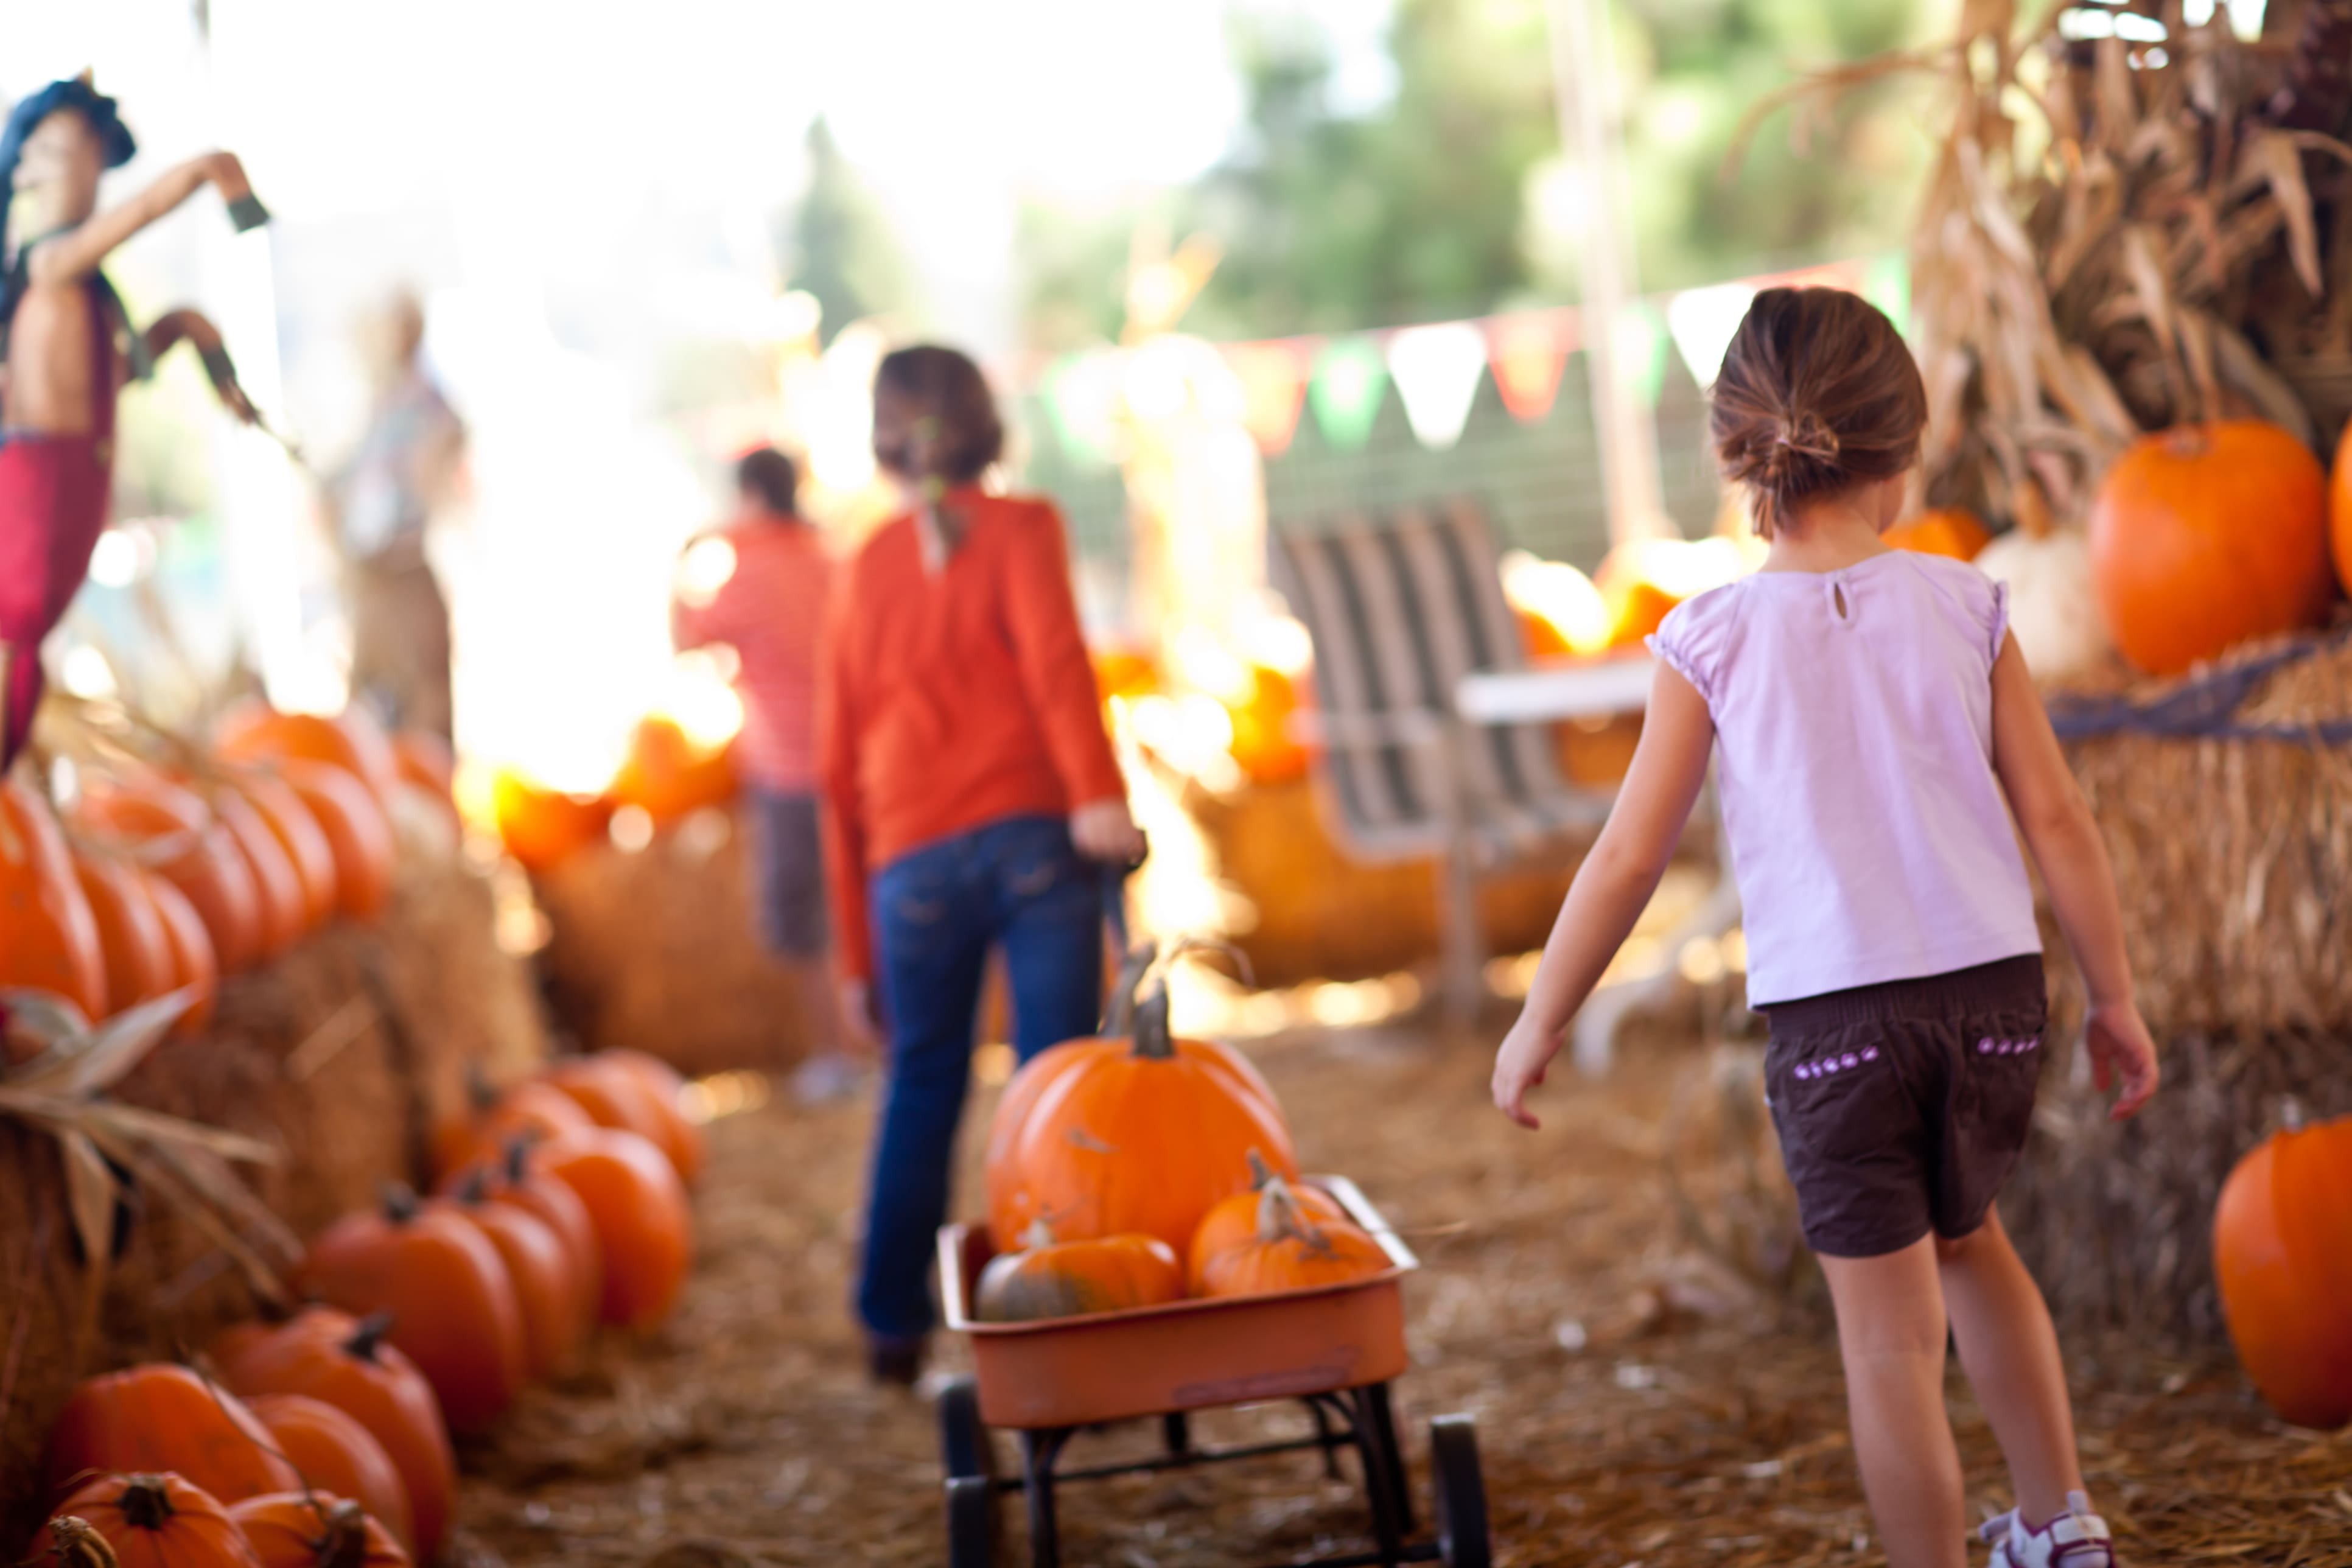 Children pulling wagon full of pumpkins